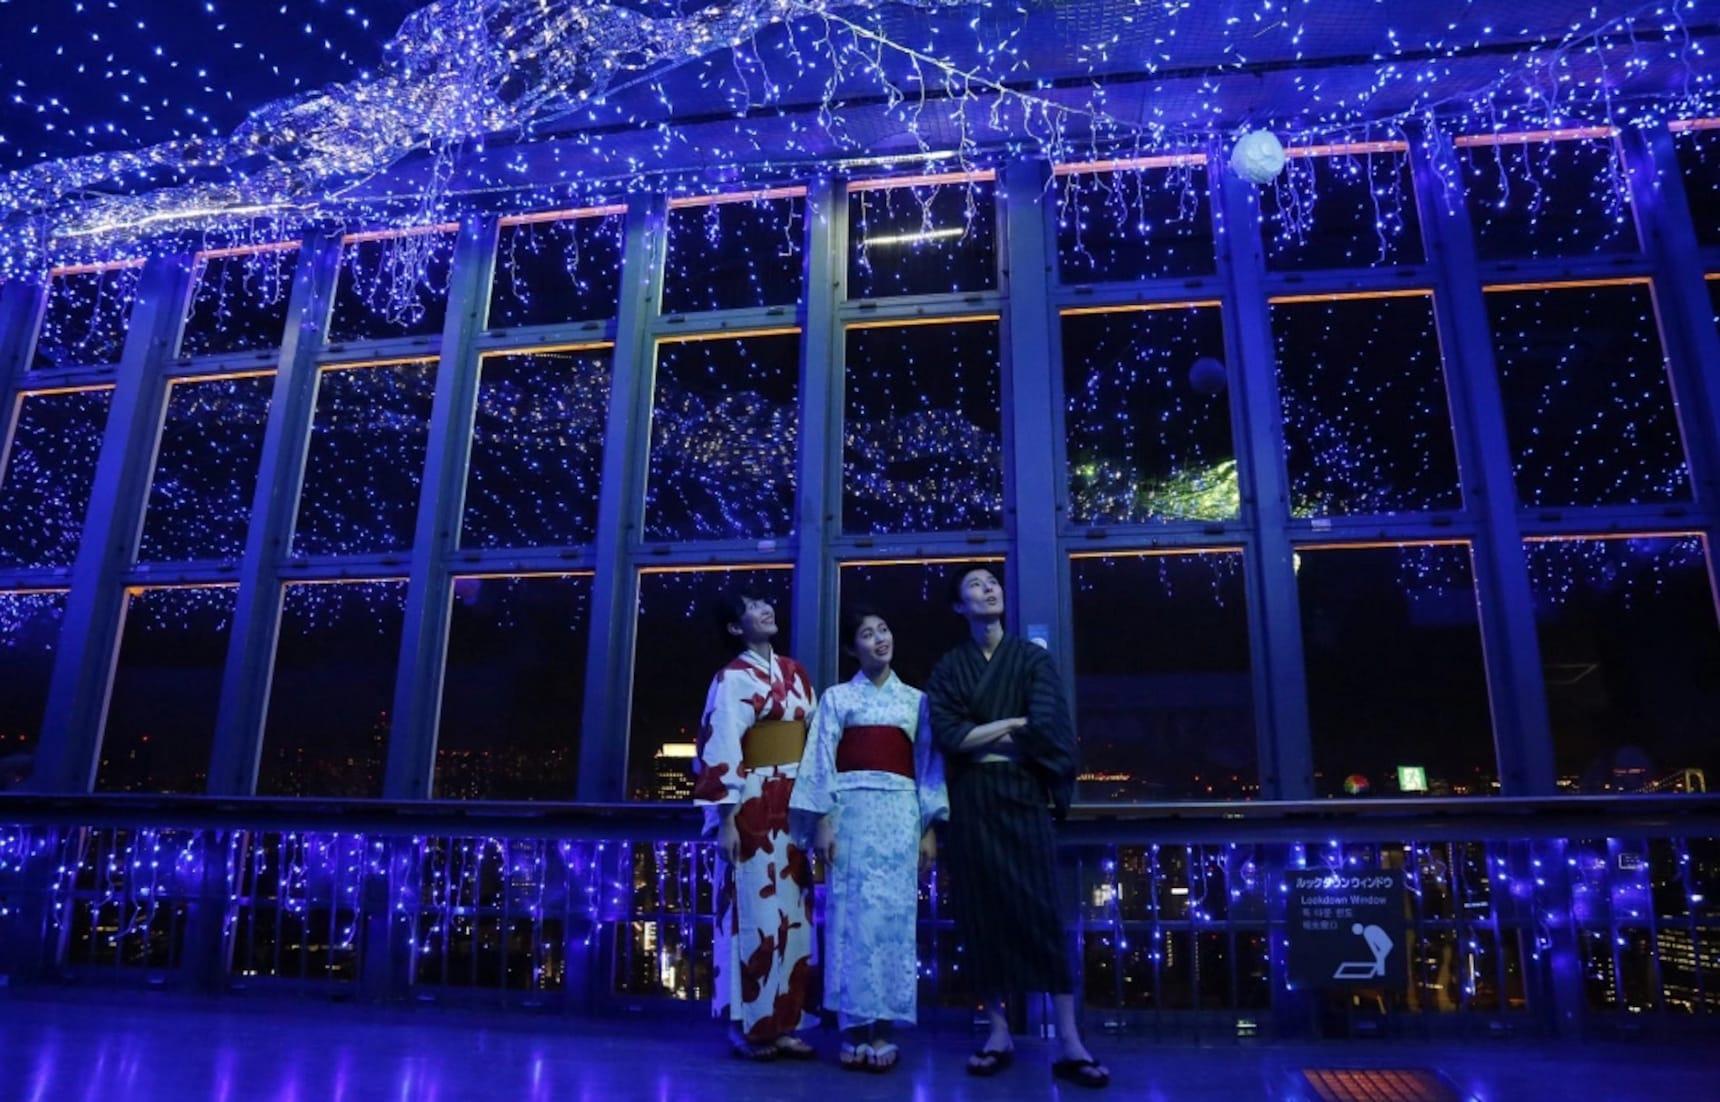 Celebrate Tanabata at Tokyo Tower